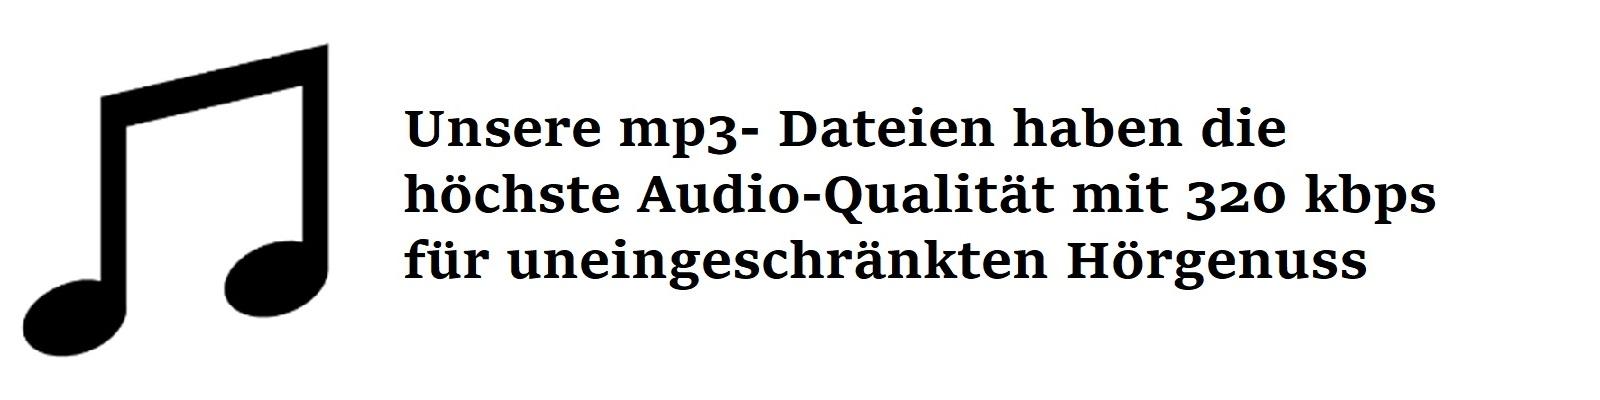 x_audioqualitaetSG7zgvH7jMxq2